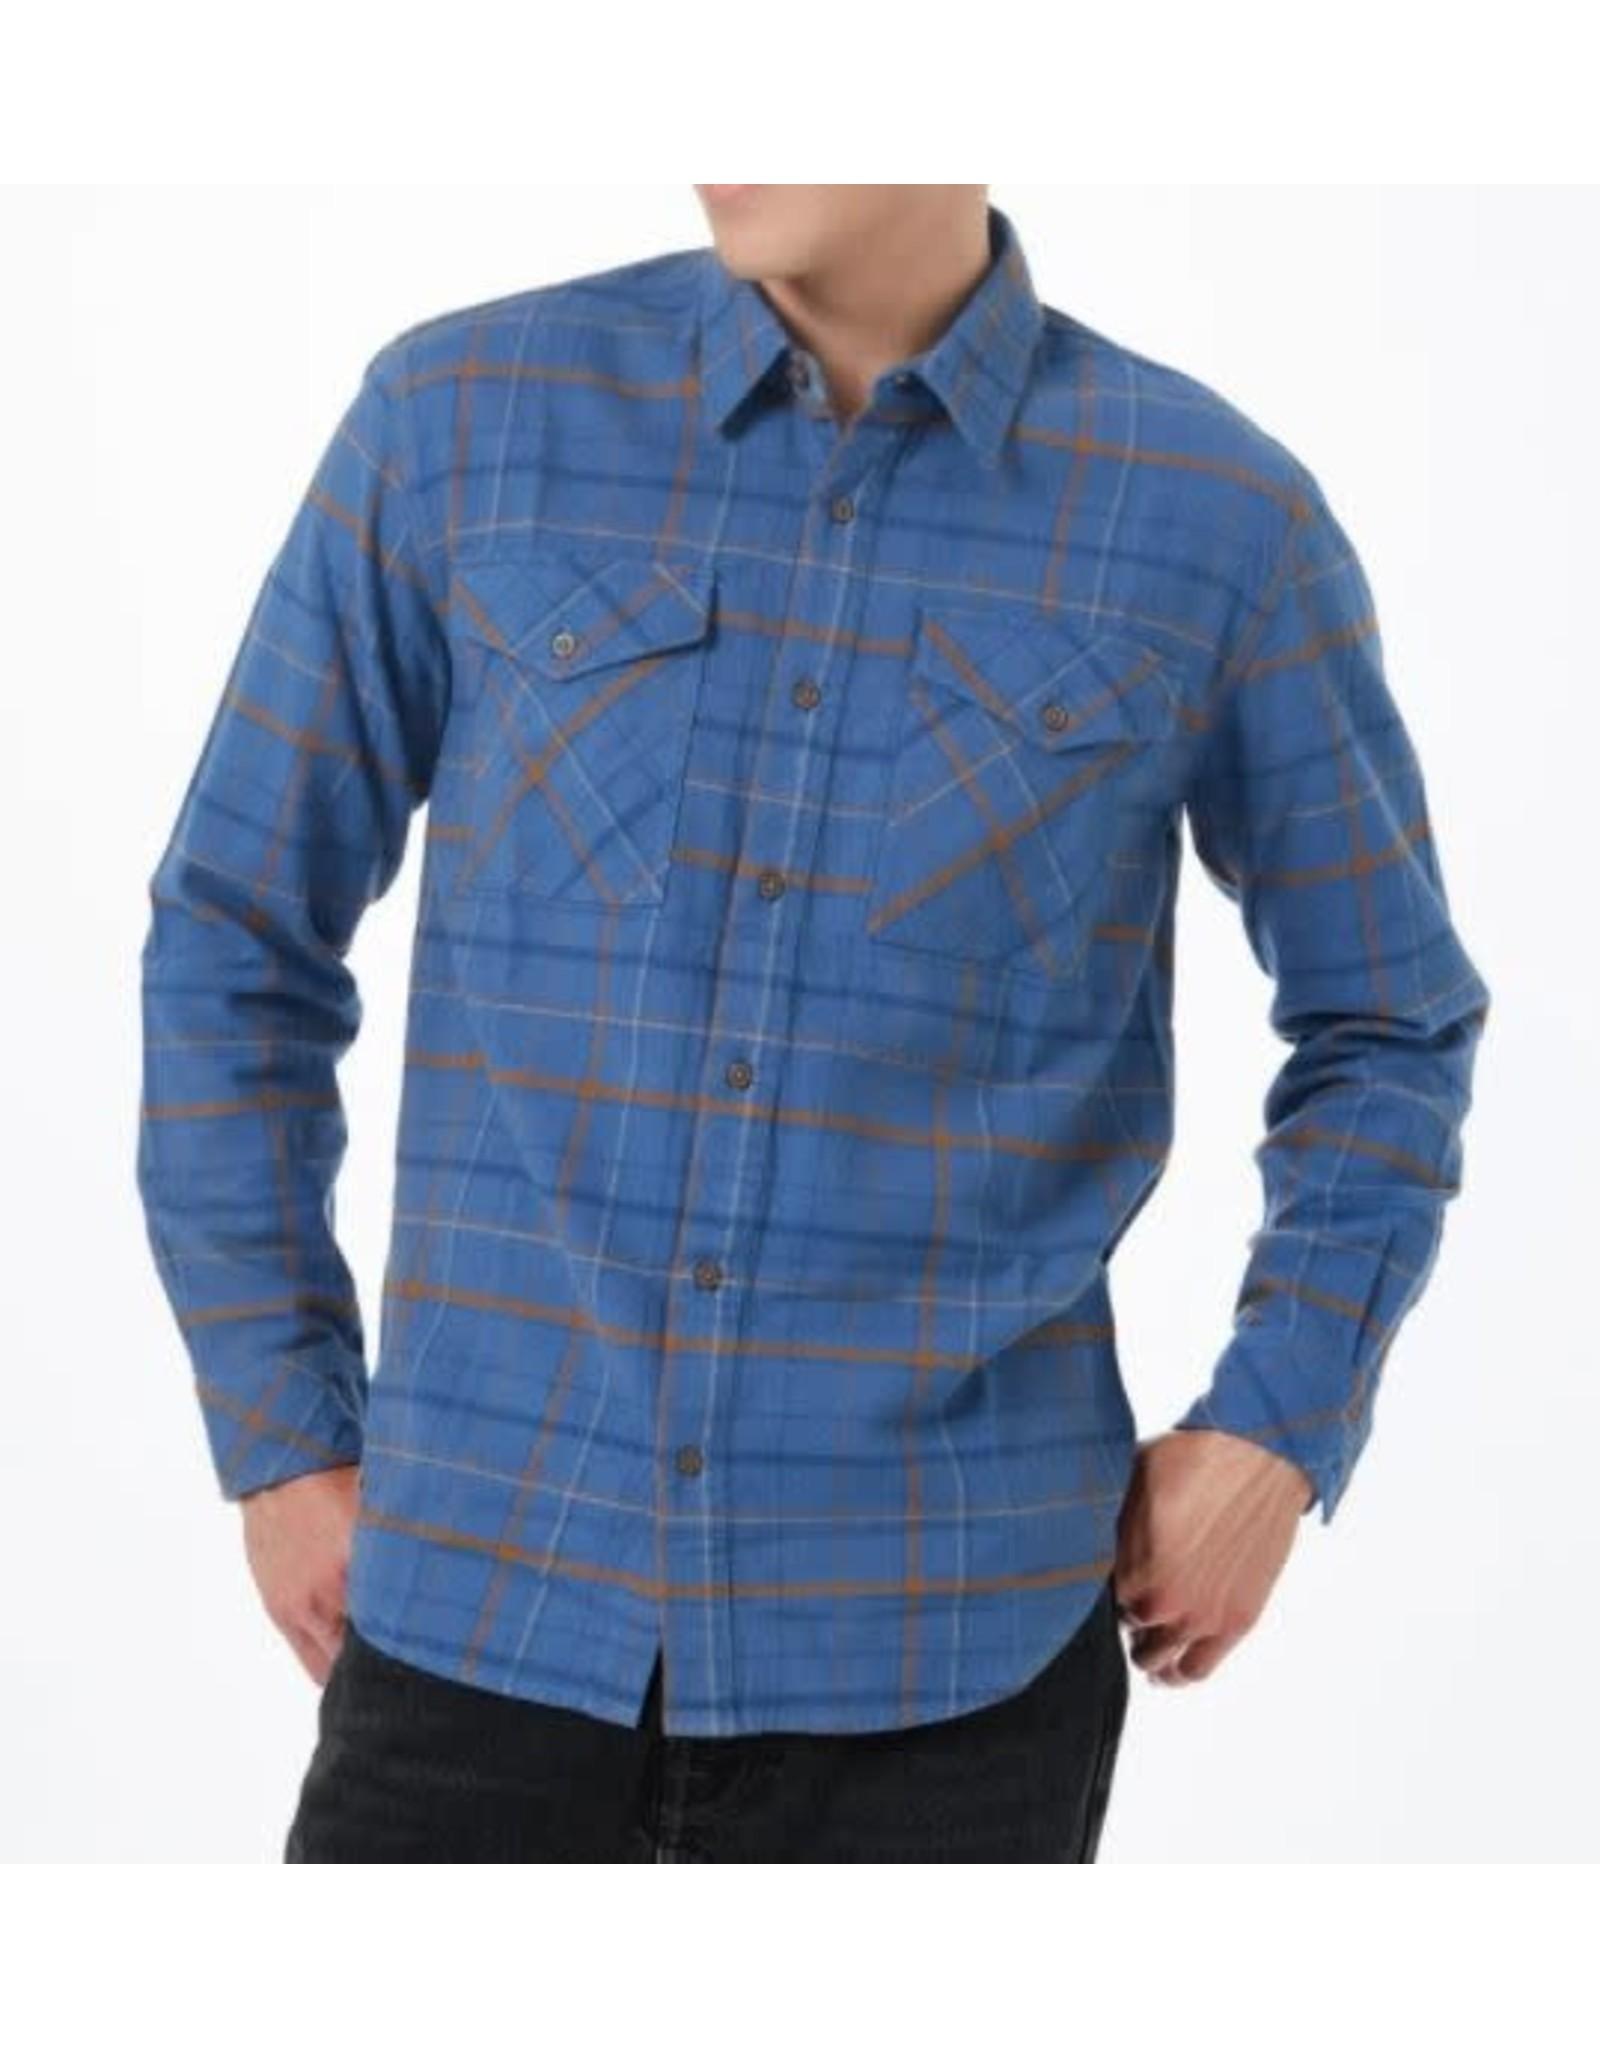 tentree Boren Flannel Shirt Spruce Blue